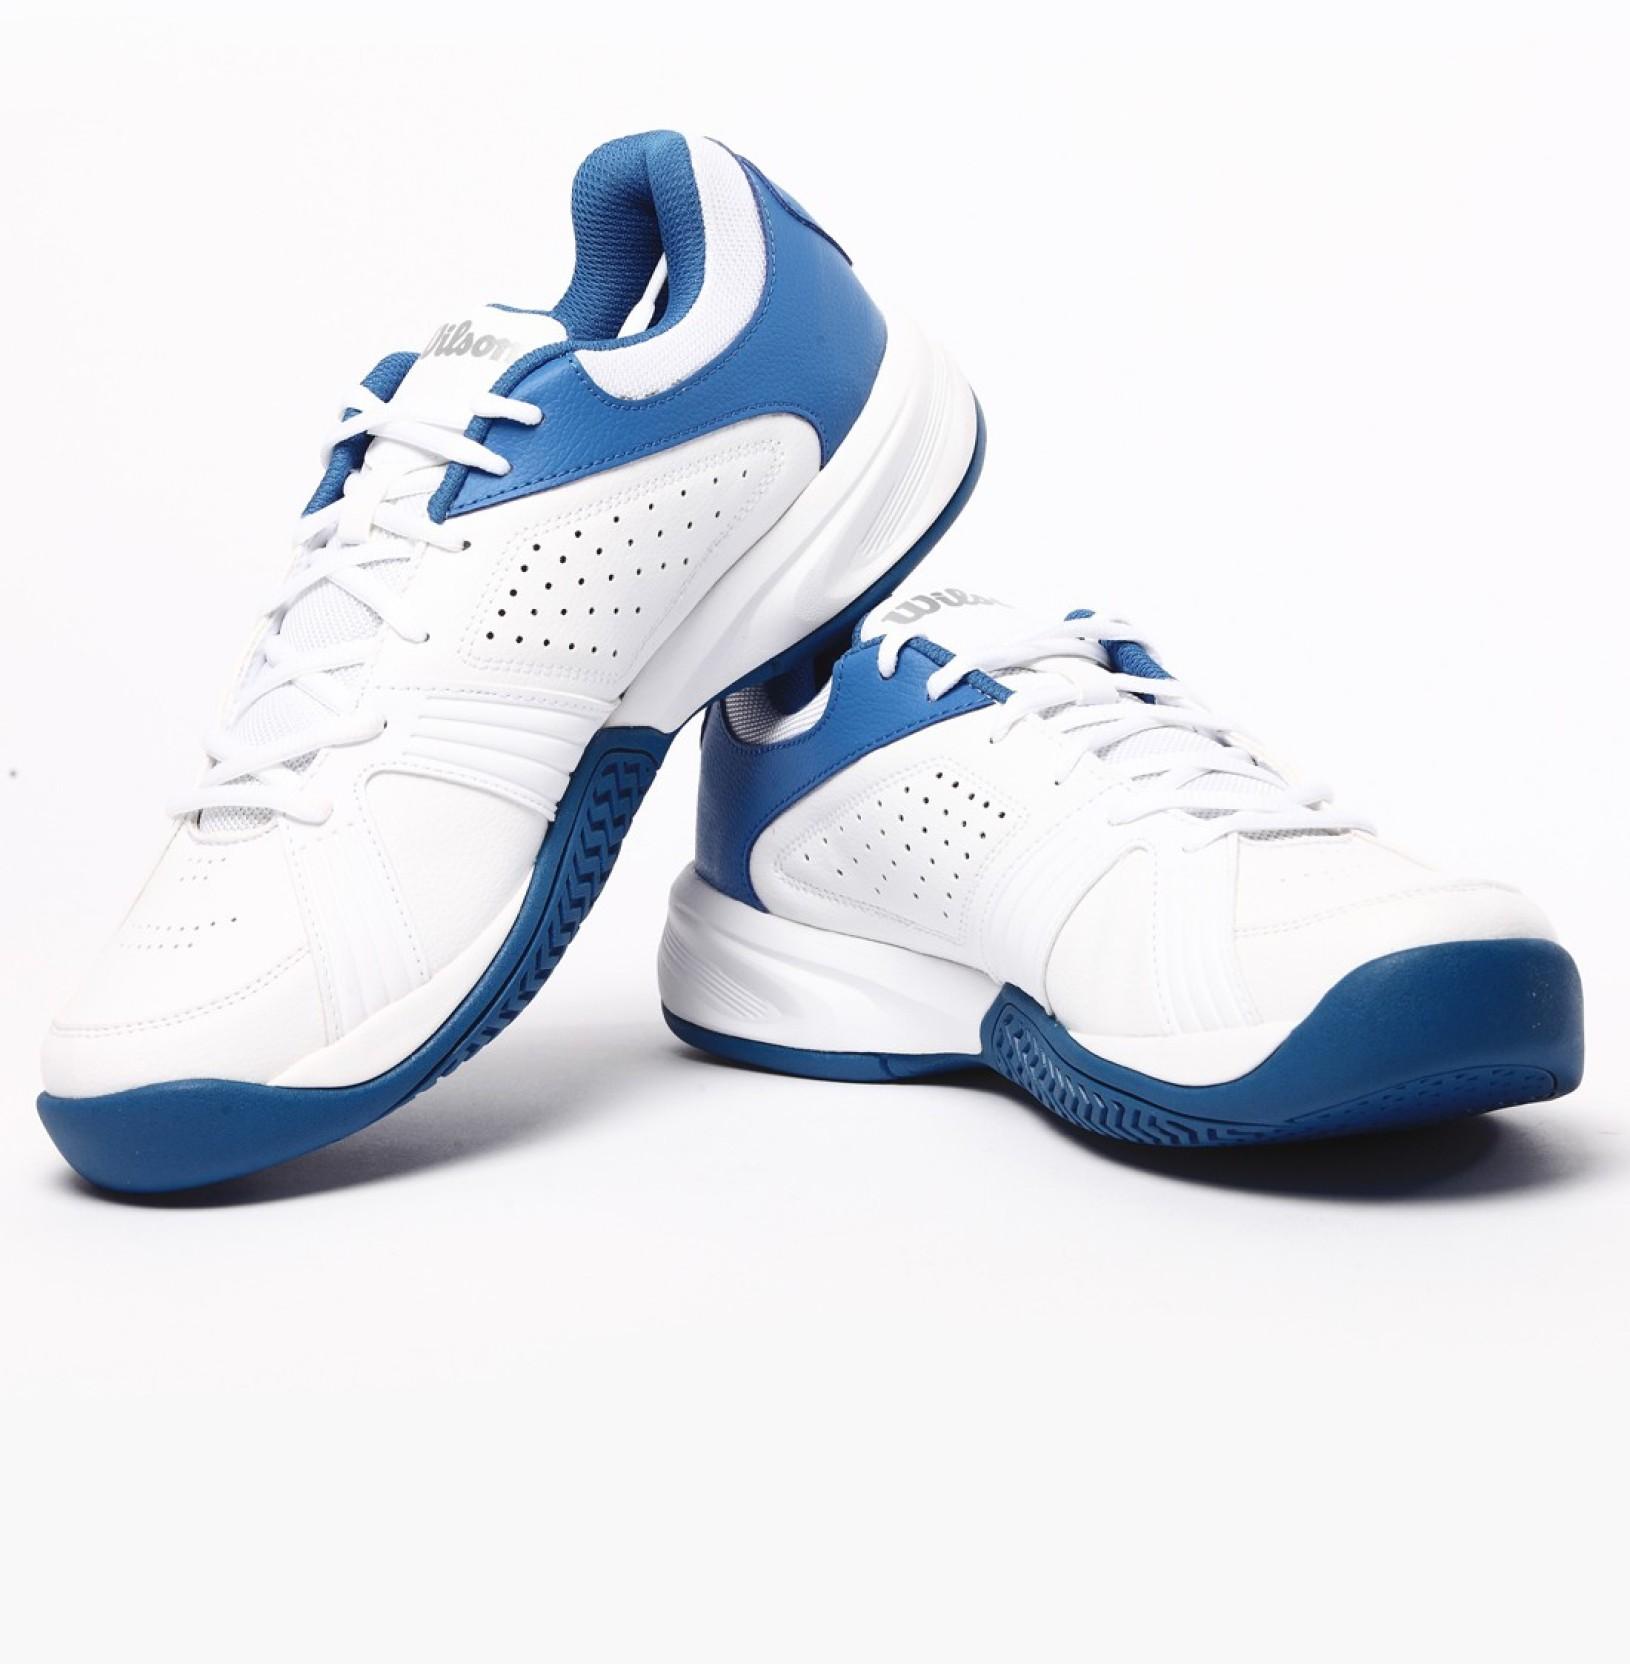 wilson swing tennis shoes buy blue color wilson